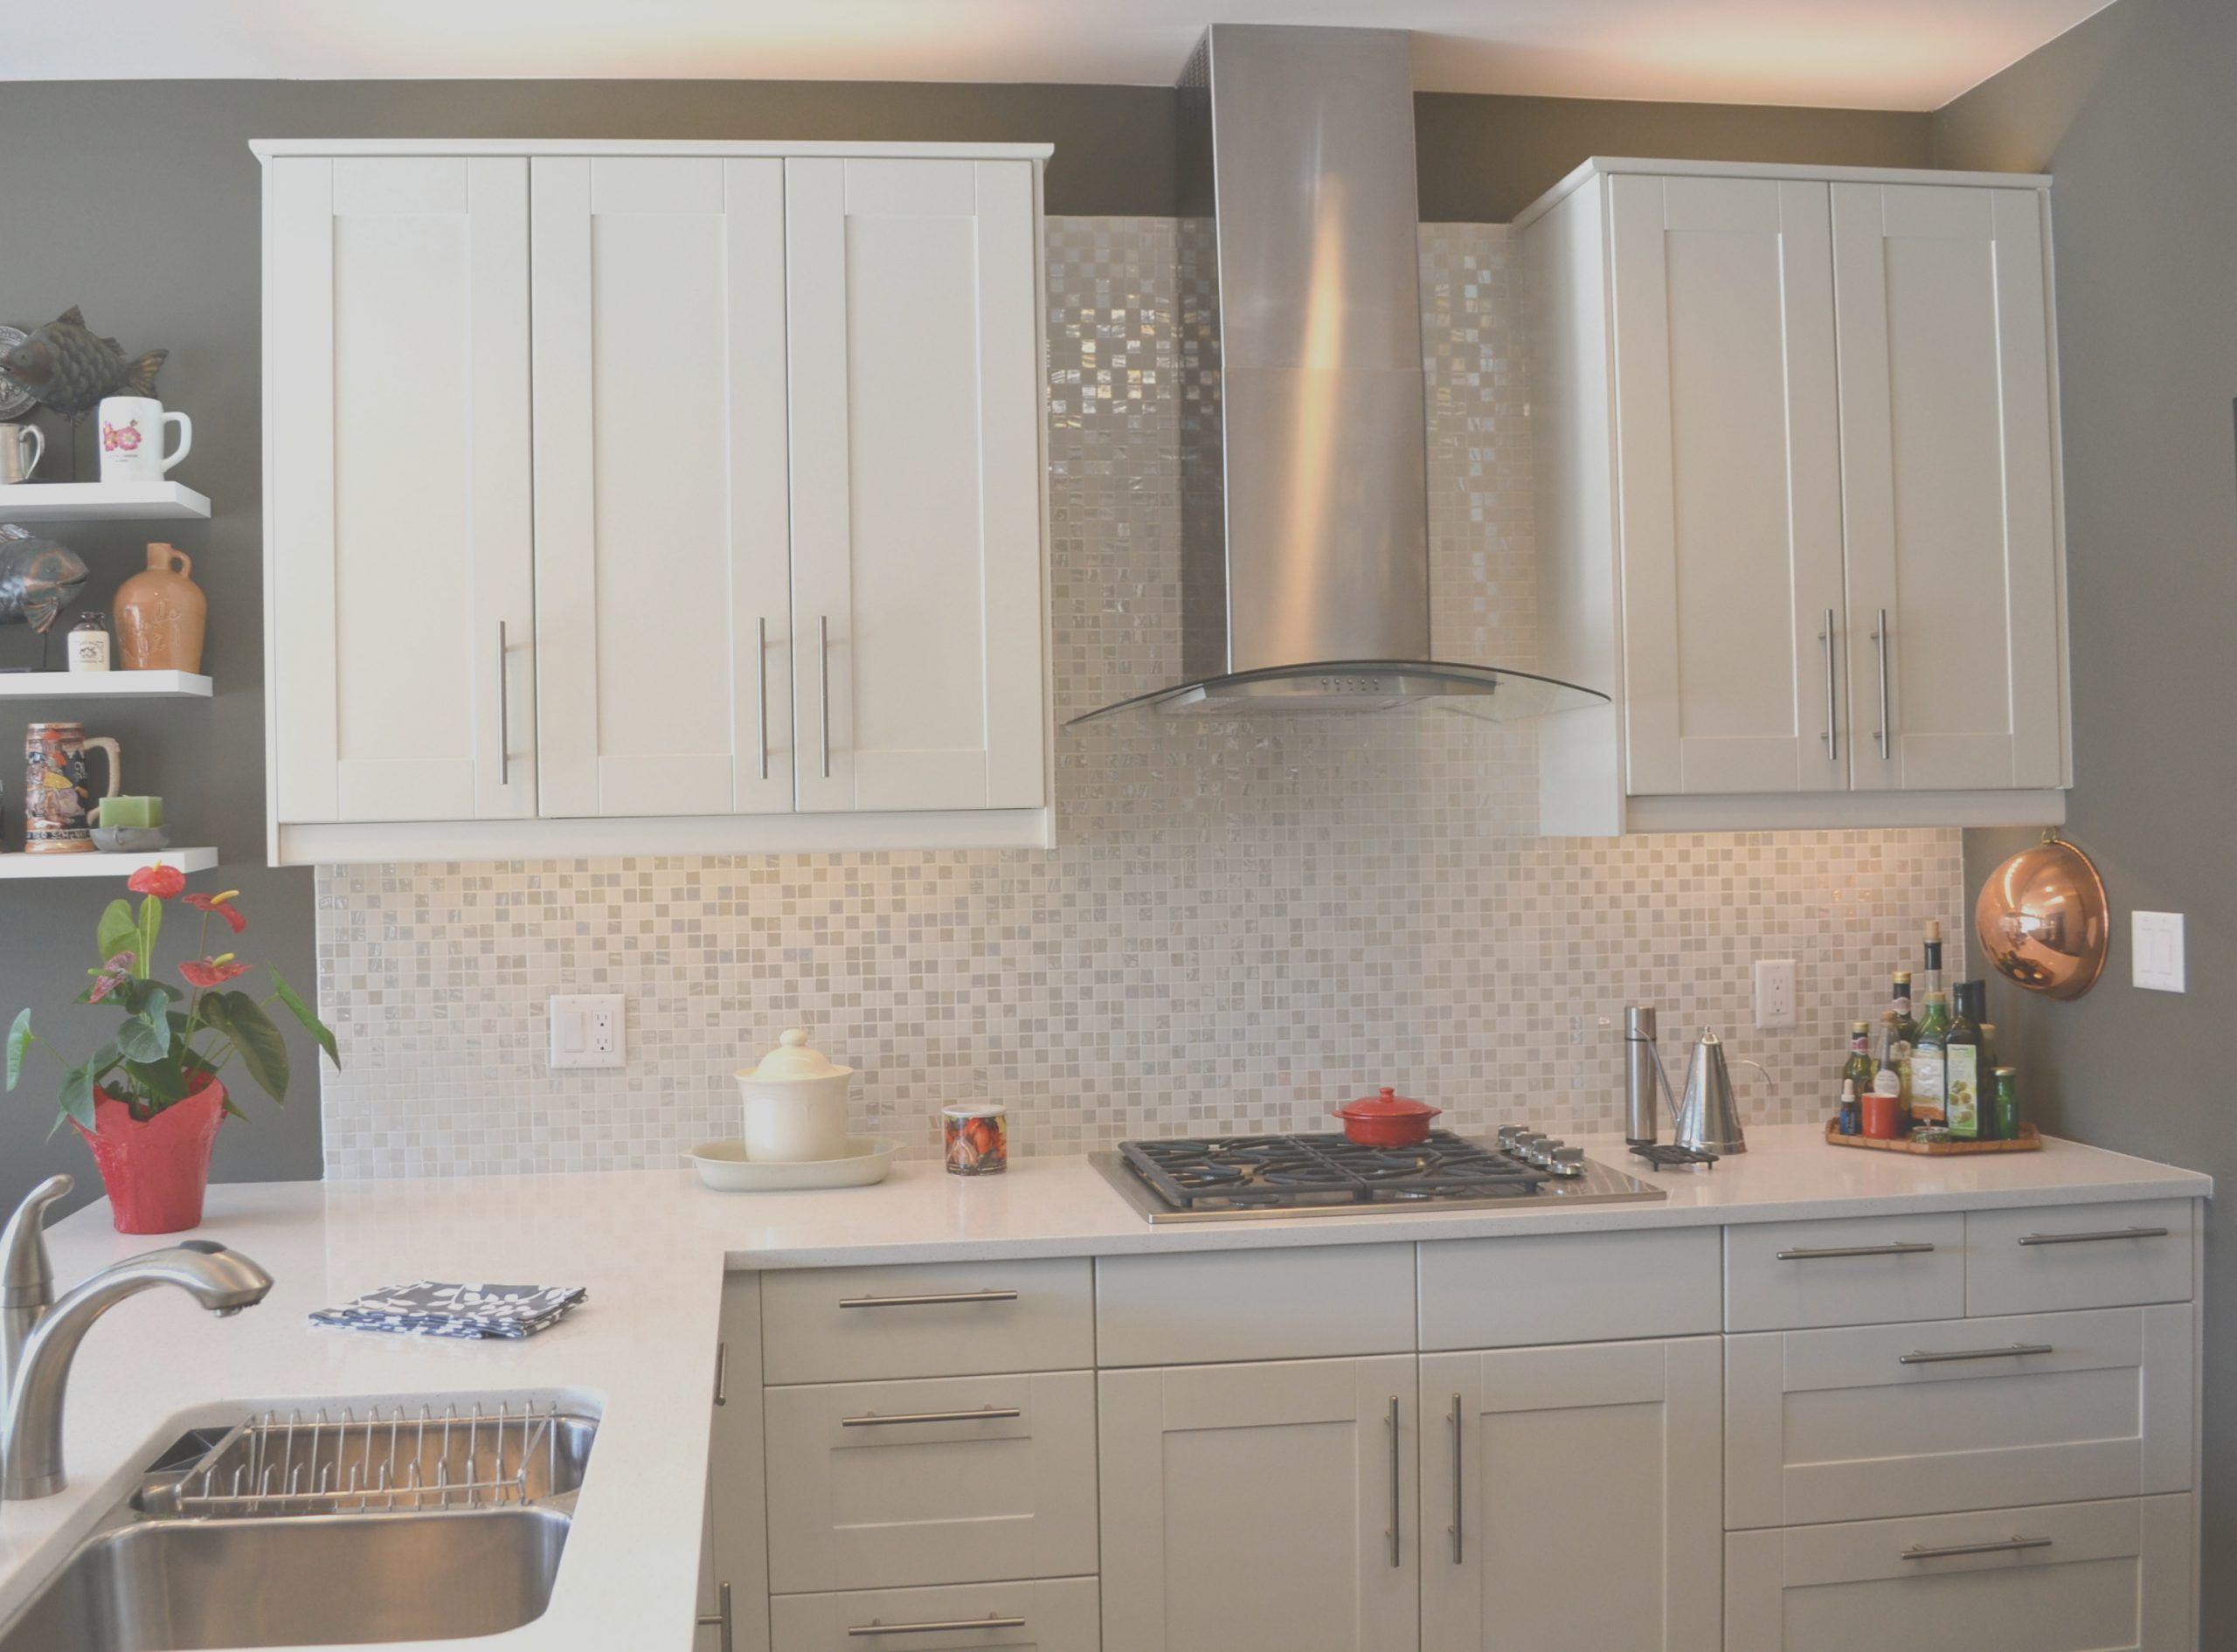 8 Outstanding Grimslov Kitchen Gallery In 2020 Budget Kitchen Remodel Beautiful Kitchen Cabinets Kitchen Remodel